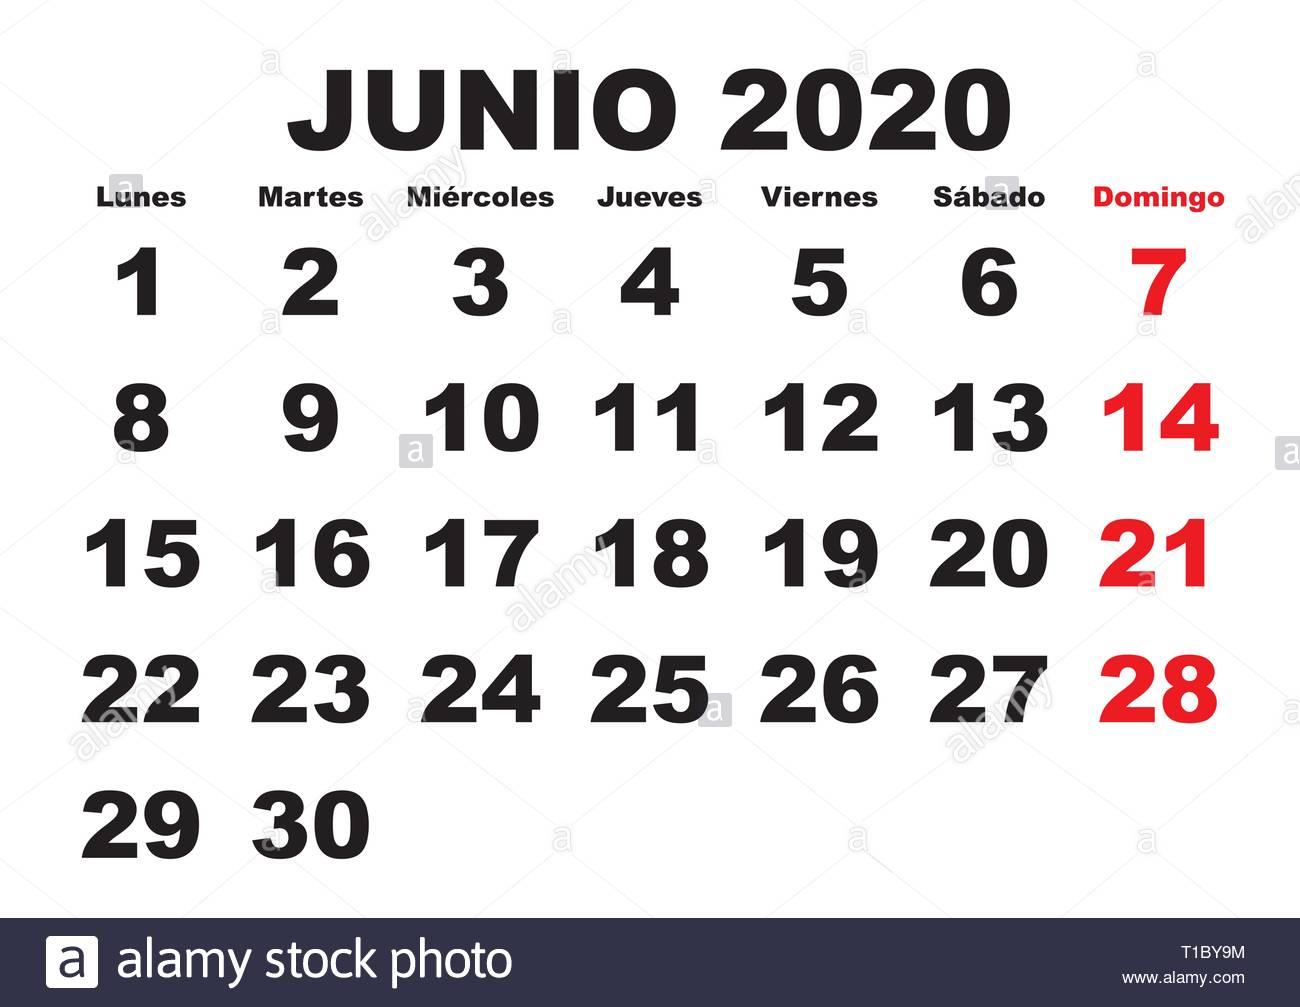 Calendario 2020 2020.June Month In A Year 2020 Wall Calendar In Spanish Junio